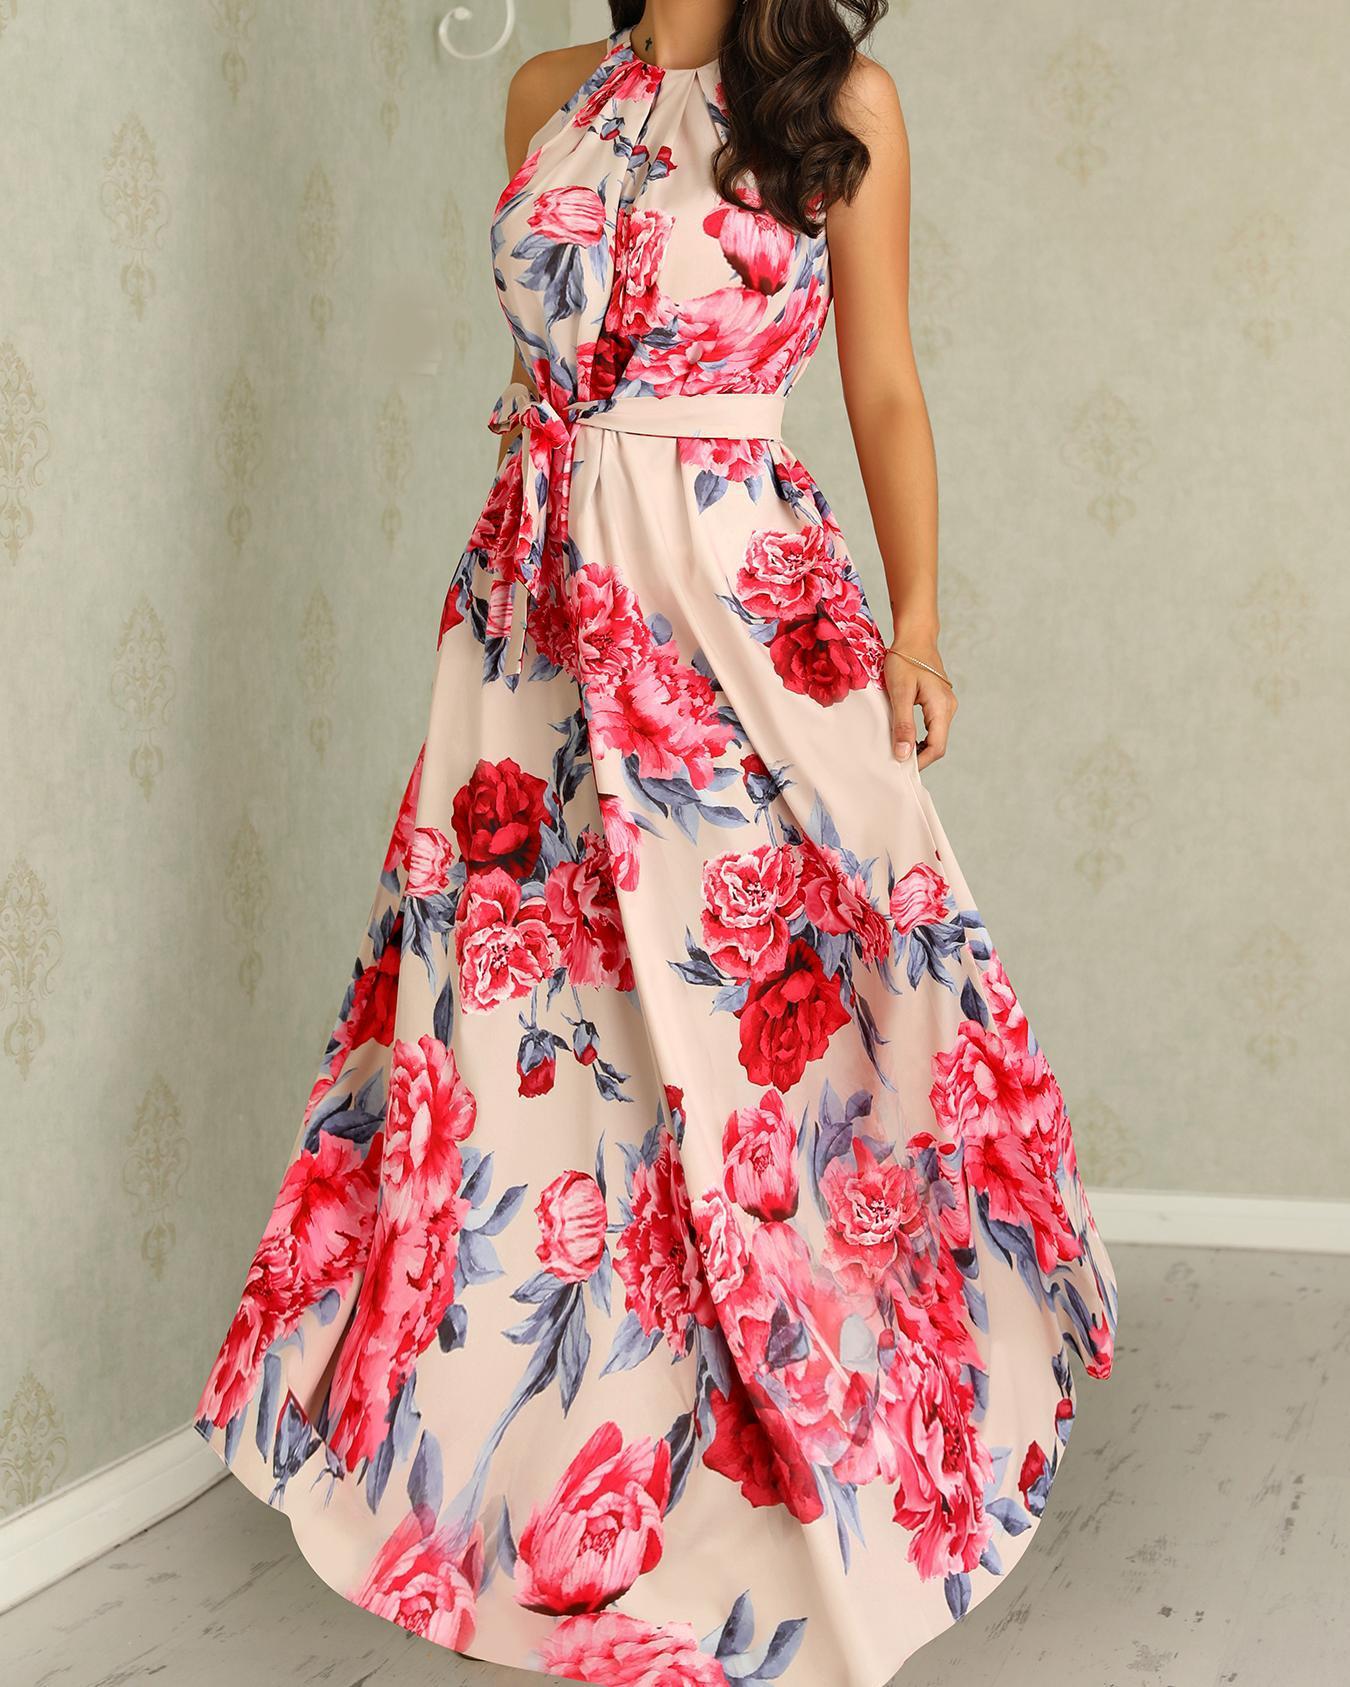 ivrose / Floral Print Sleeveless Belted Maxi Dress